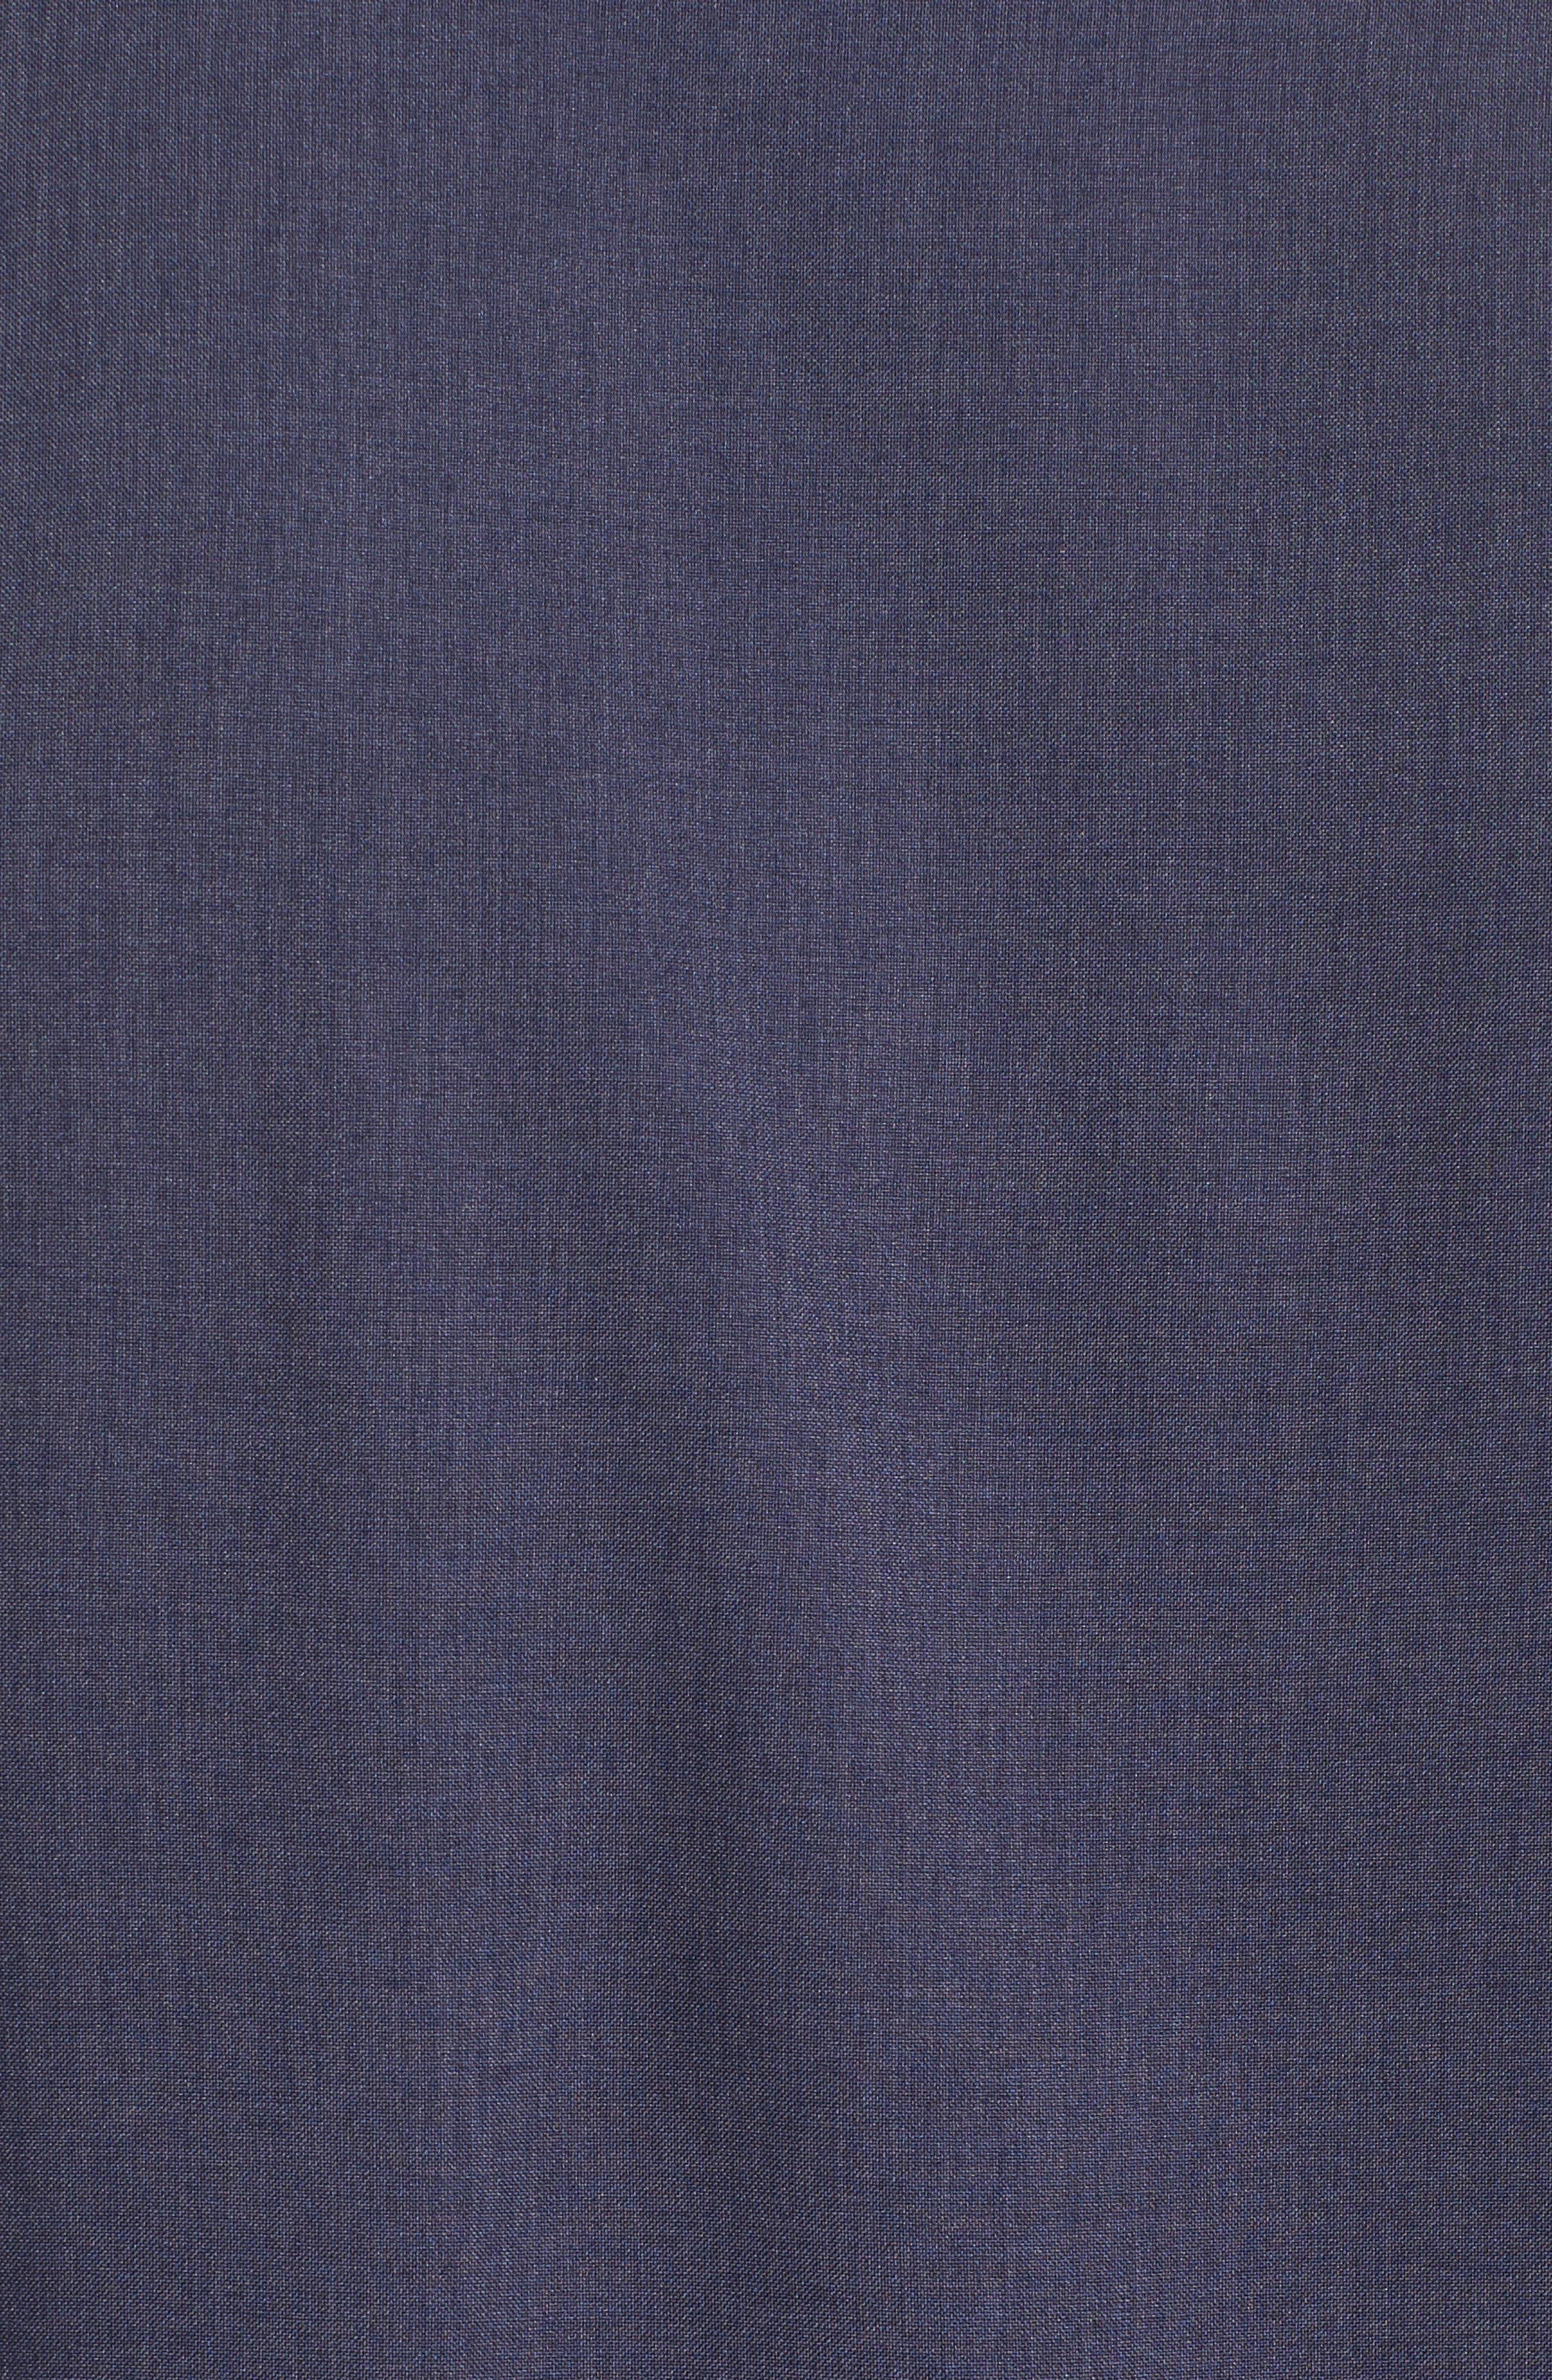 Trim Fit Performance Knit Sport Shirt,                             Alternate thumbnail 5, color,                             NAVY